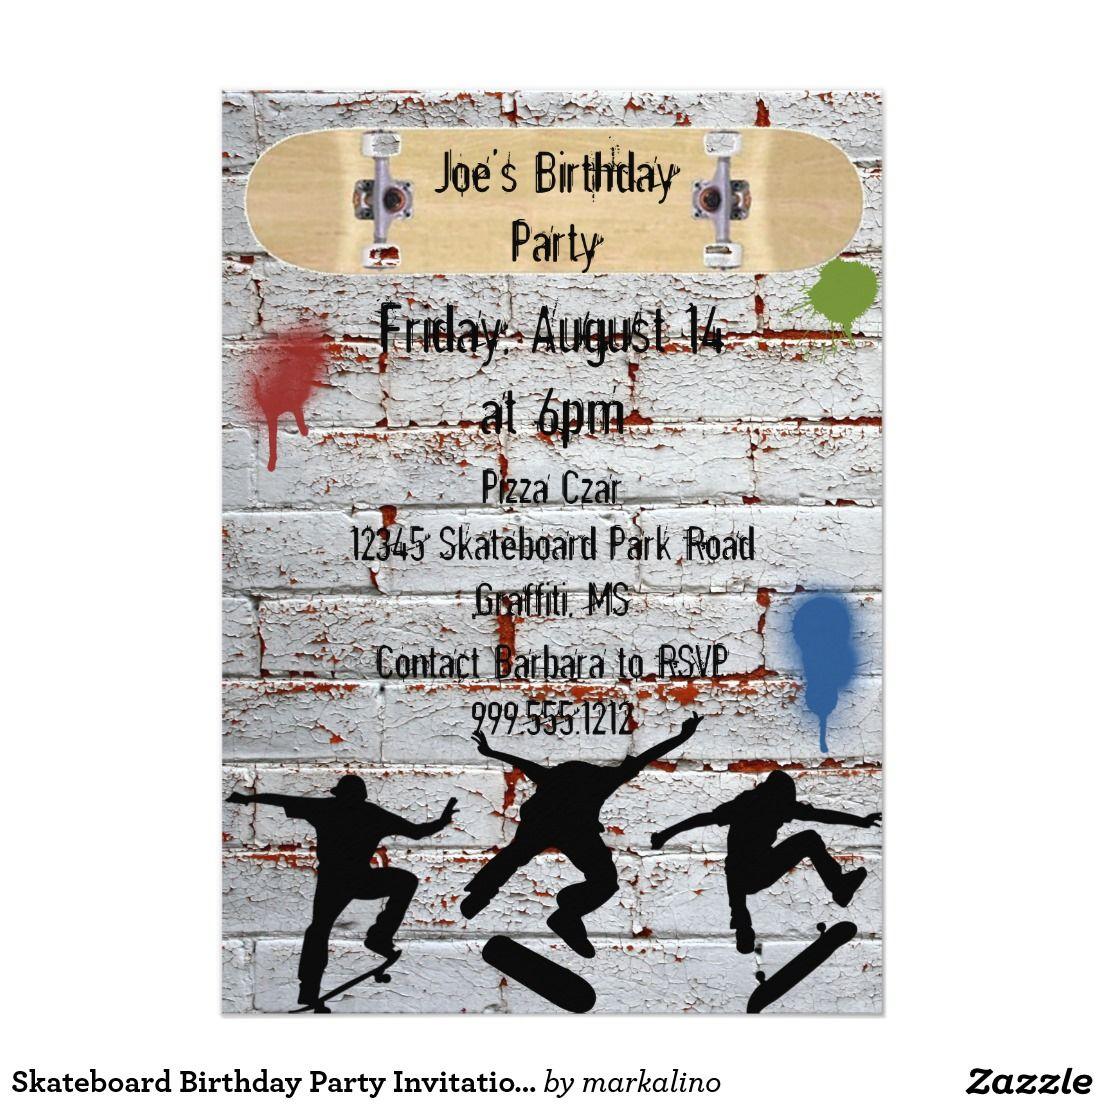 Skateboard Birthday Party Invitations | Zazzle - Invitations ...